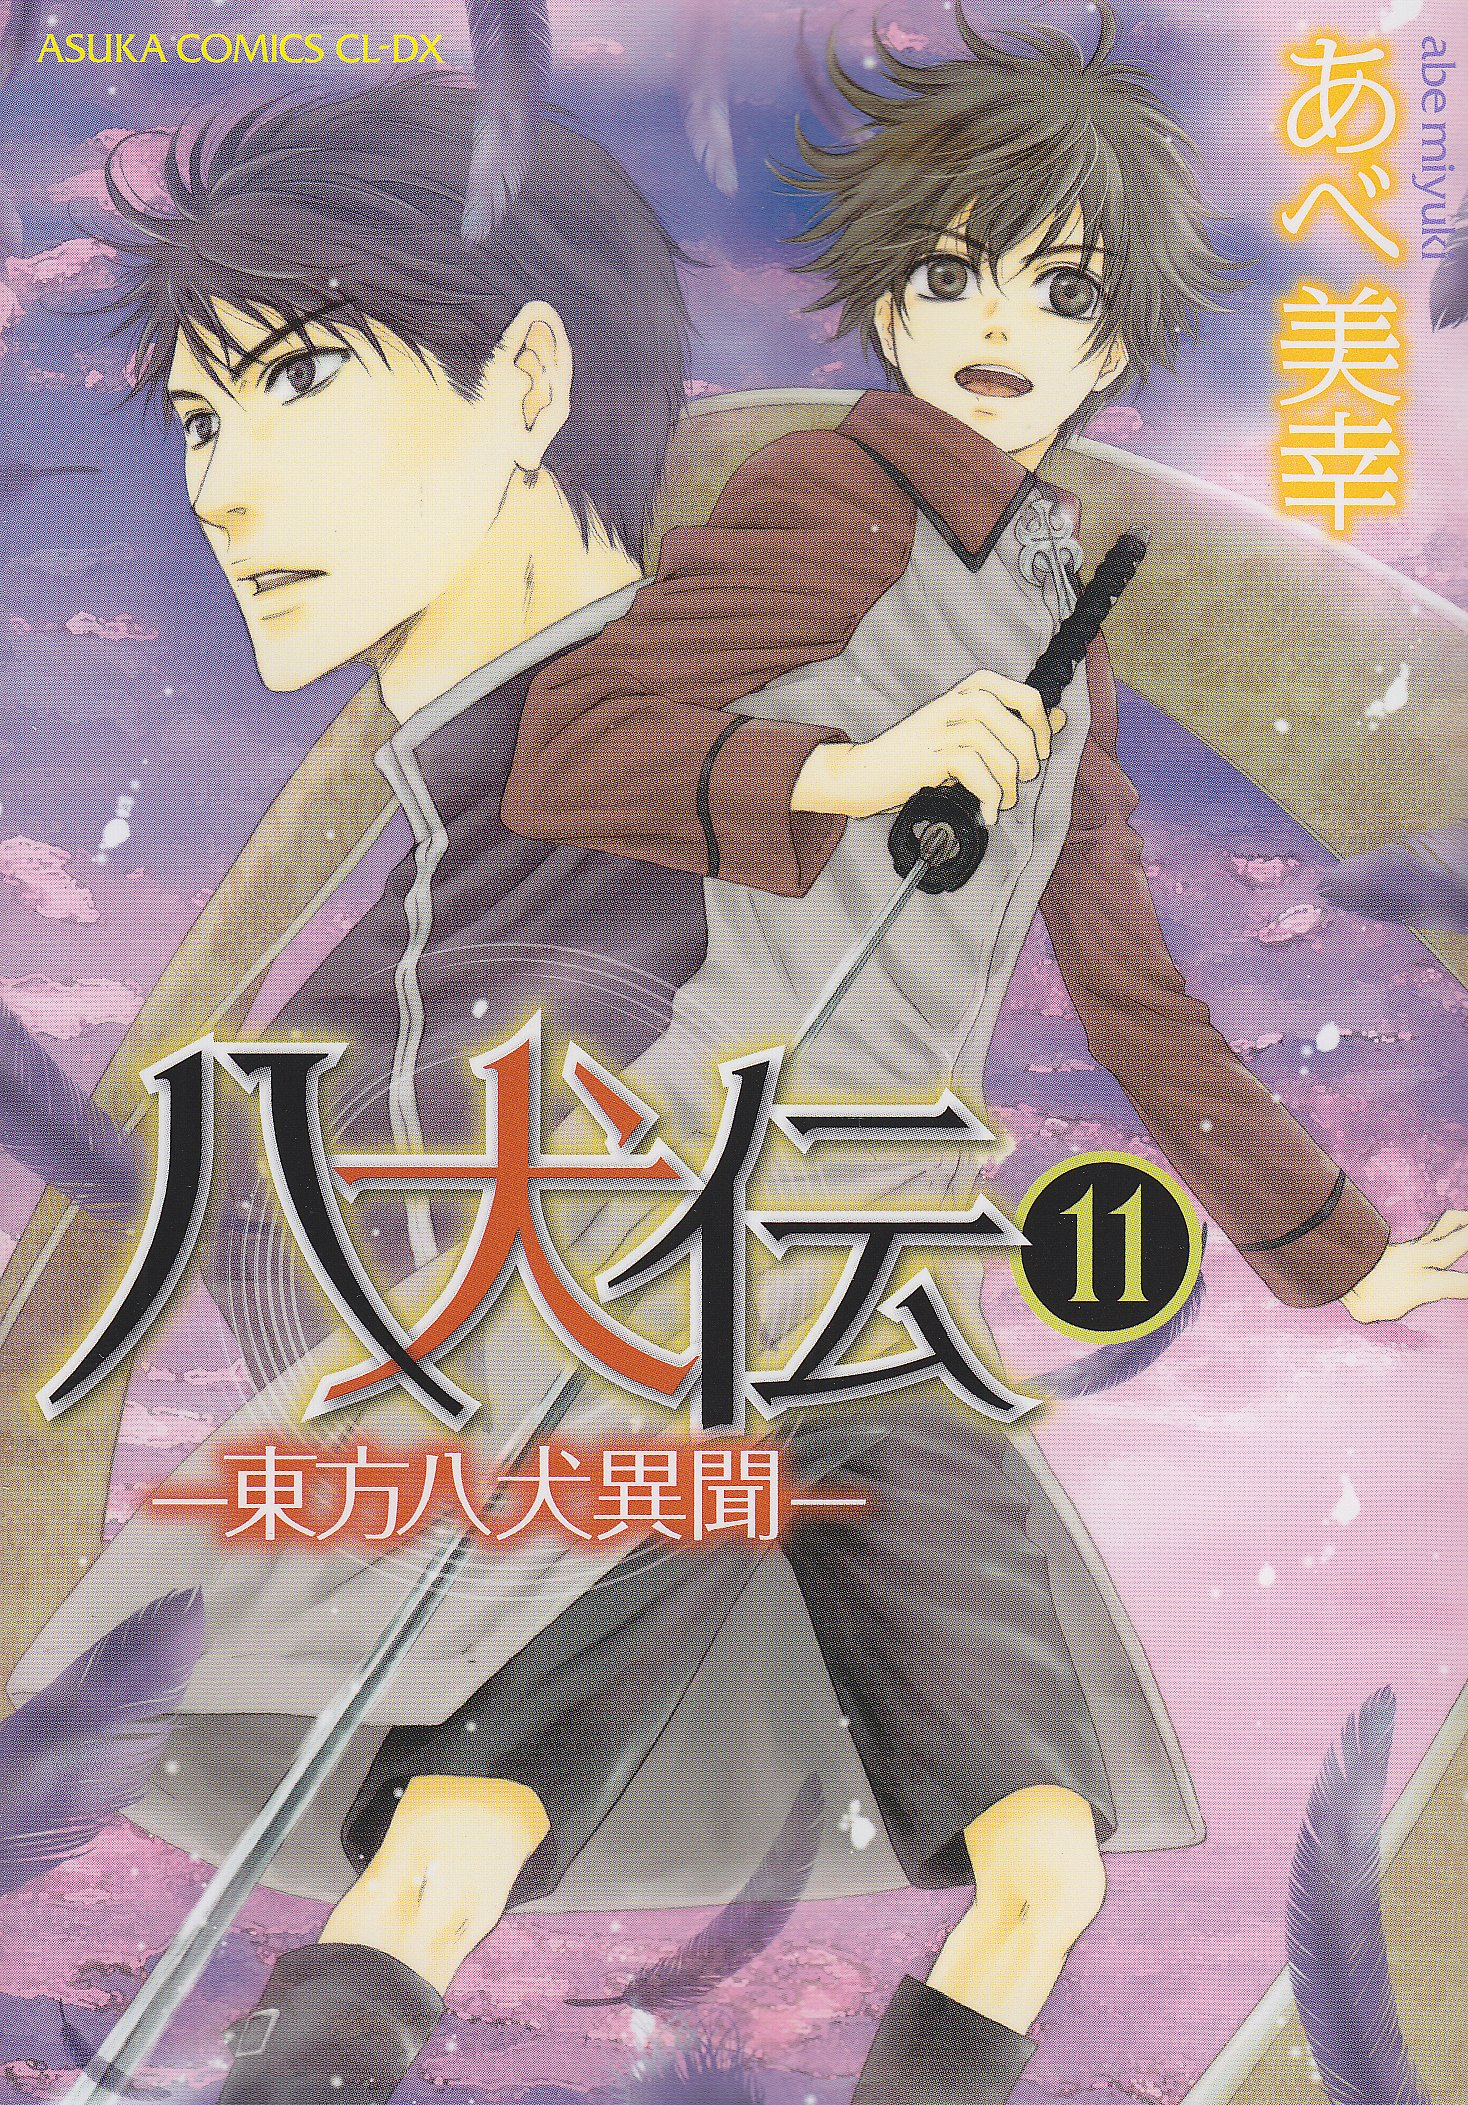 Download Hakkenden - Toho Hakken Ibun - Vol.11 (Asuka Comics CL-DX) Manga pdf